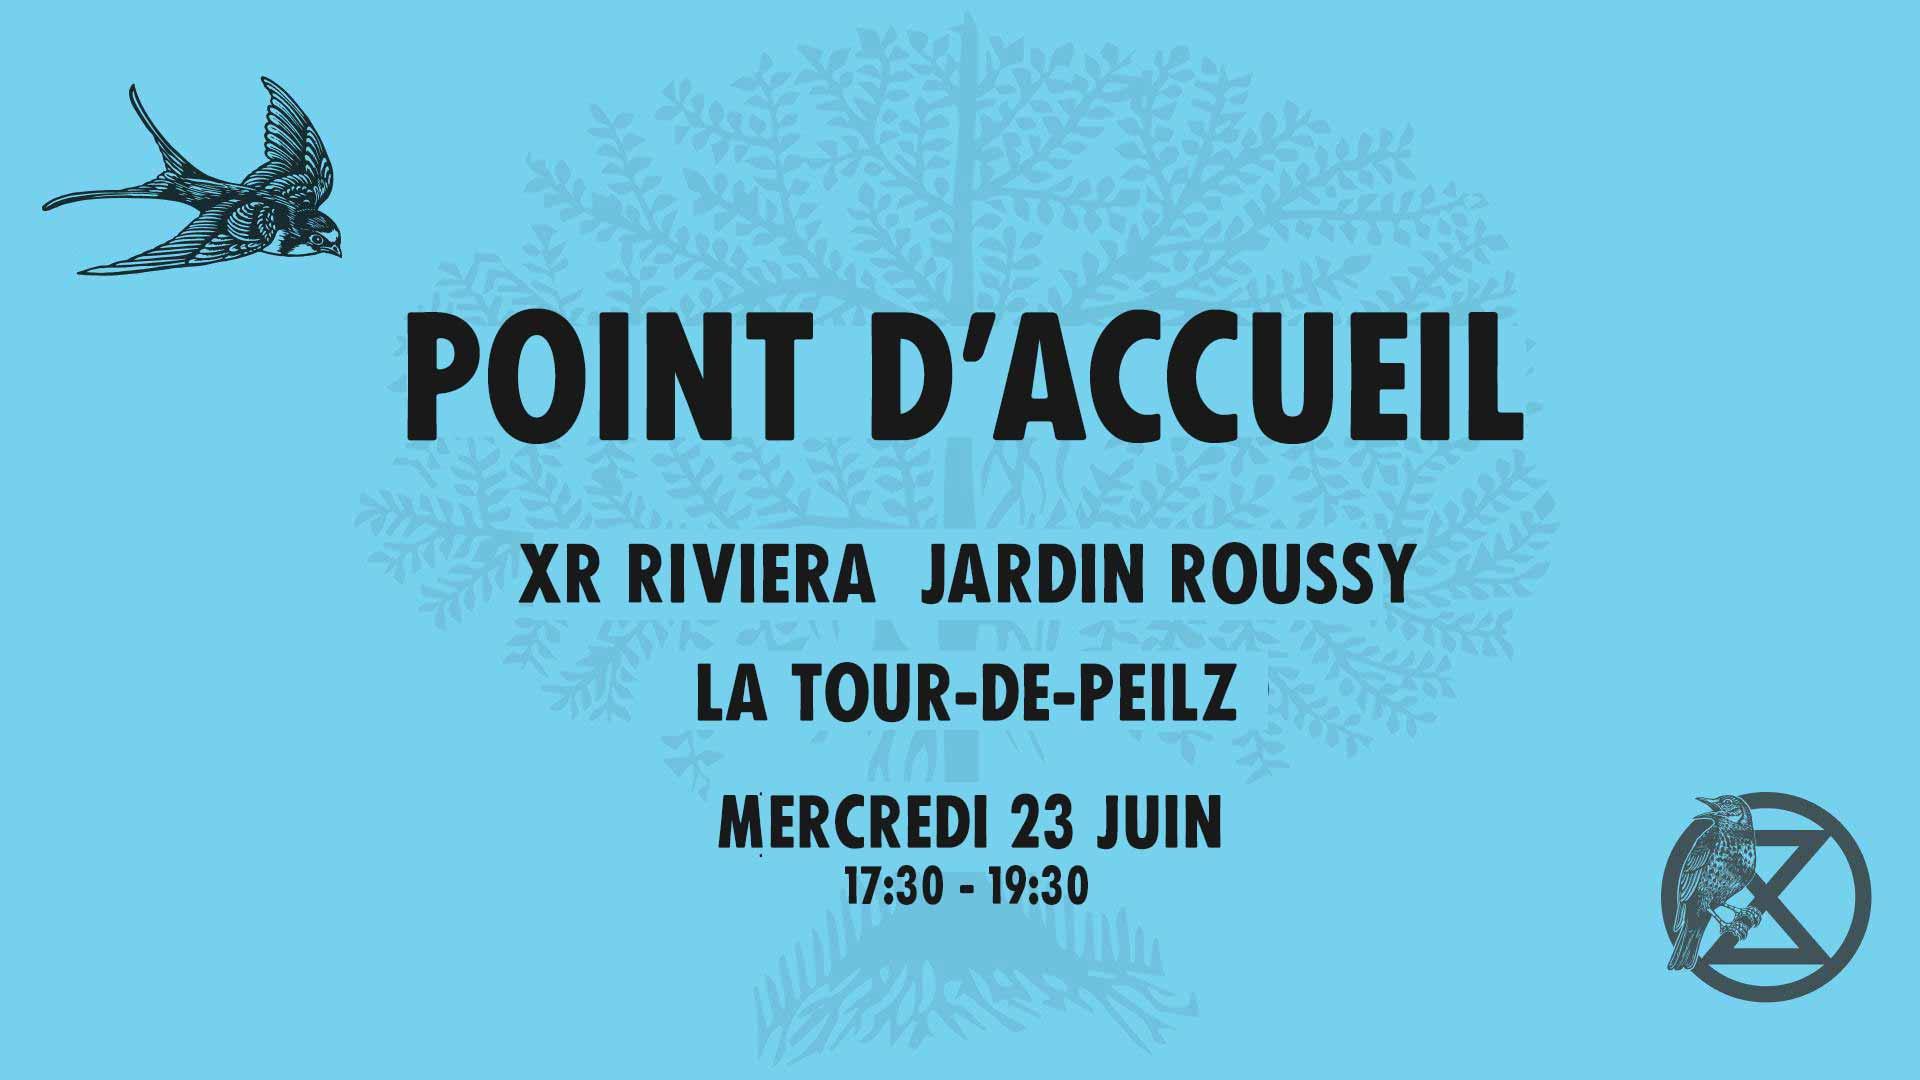 Point d'accueil  XR Riviera  Jardin Roussy